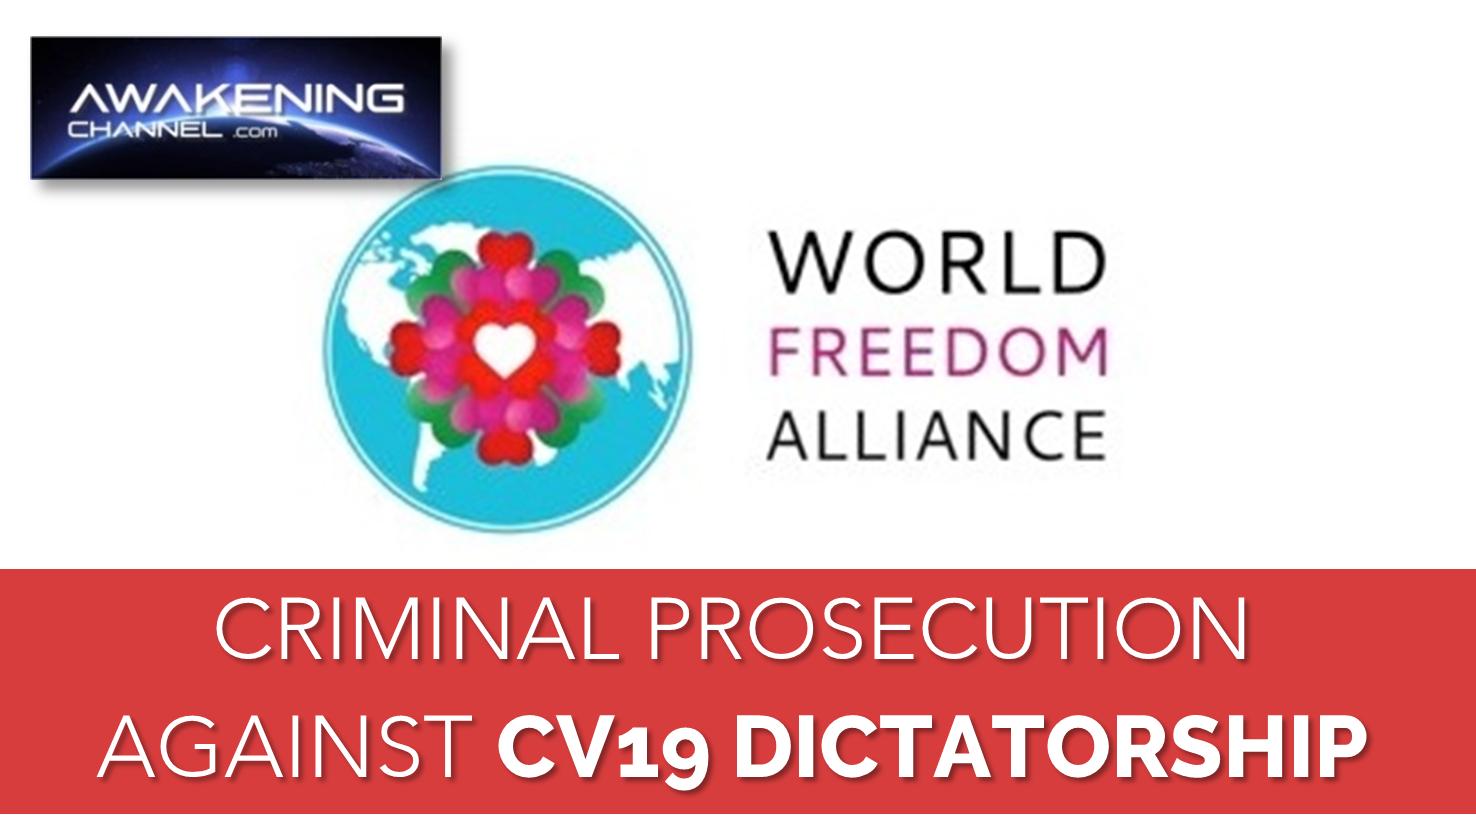 Criminal Prosecution against CV19 Dictatorship